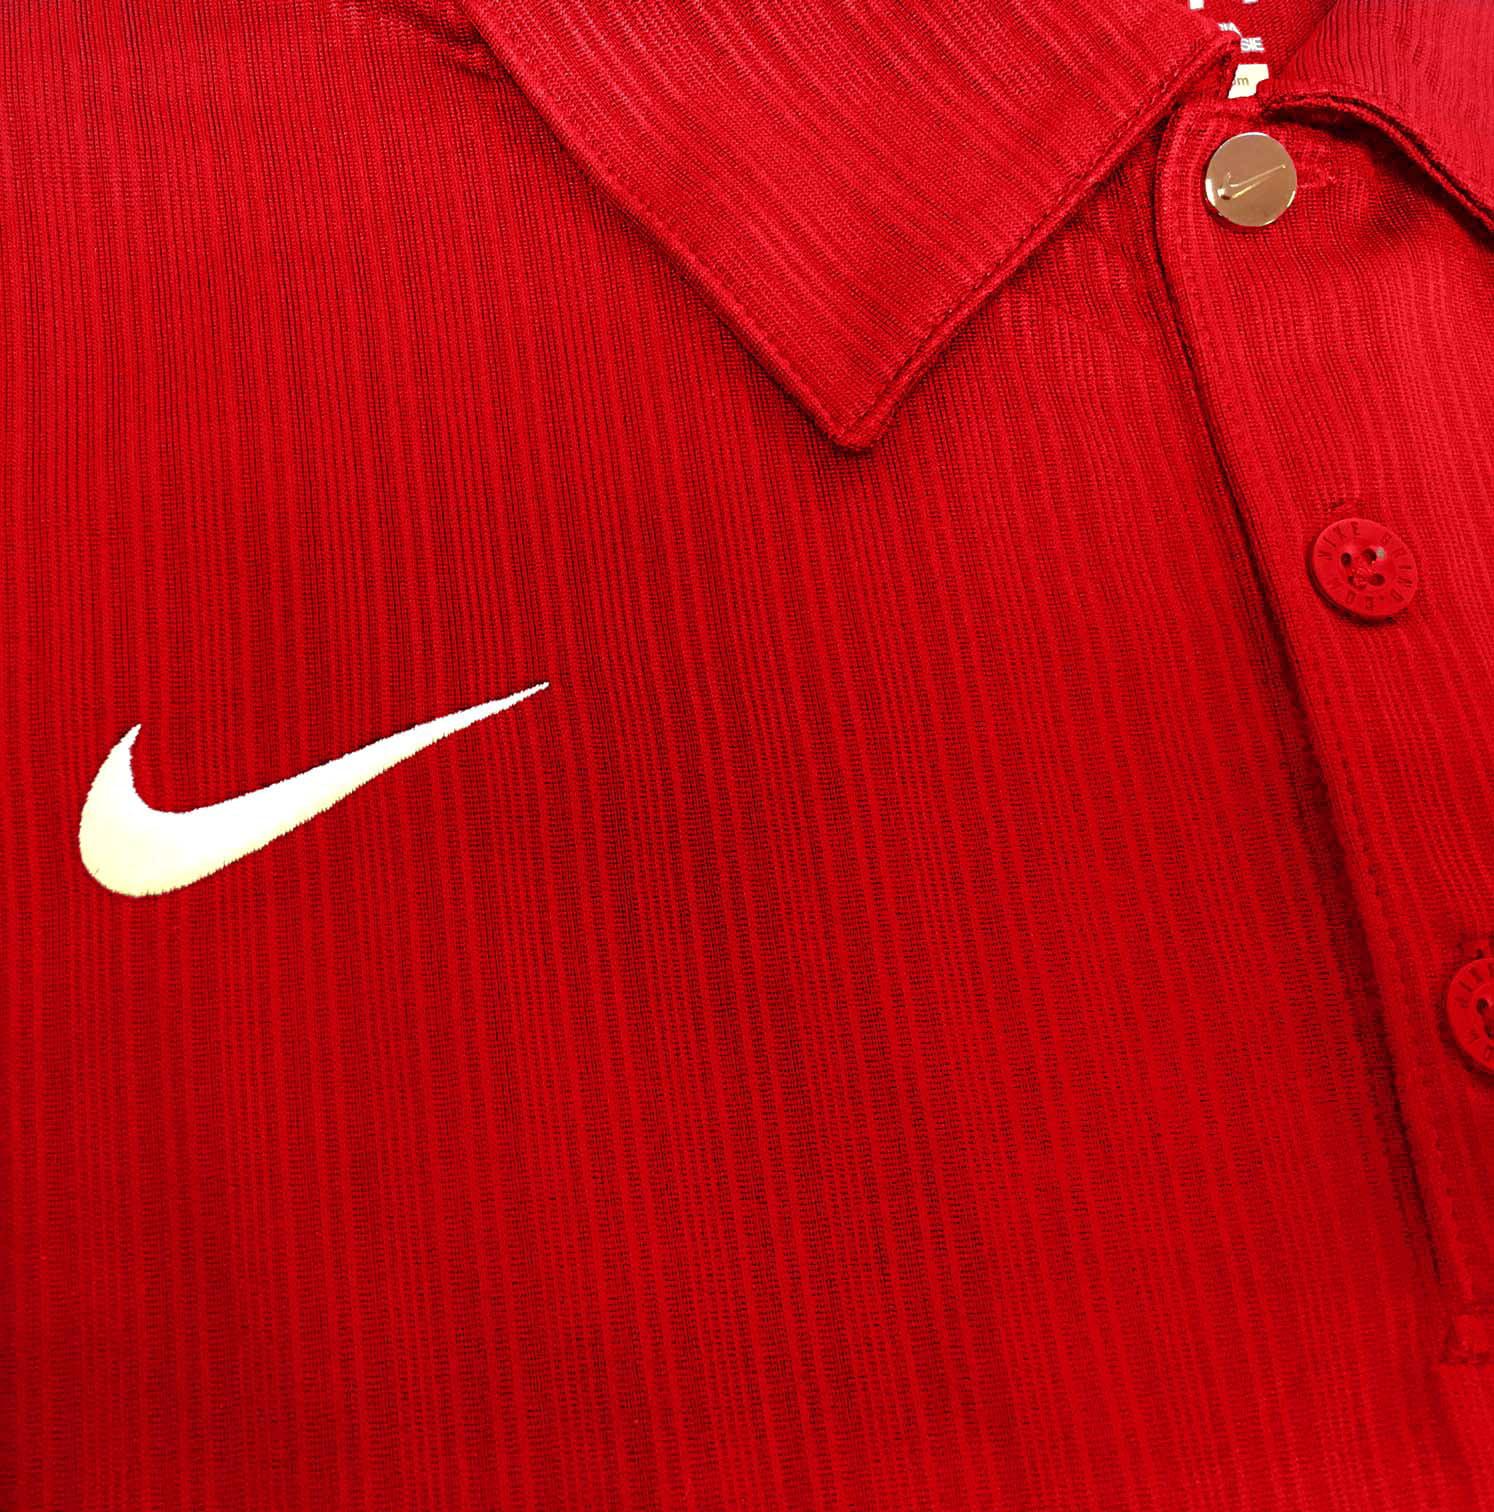 Nike Red Polo T Shirt Lauren Goss